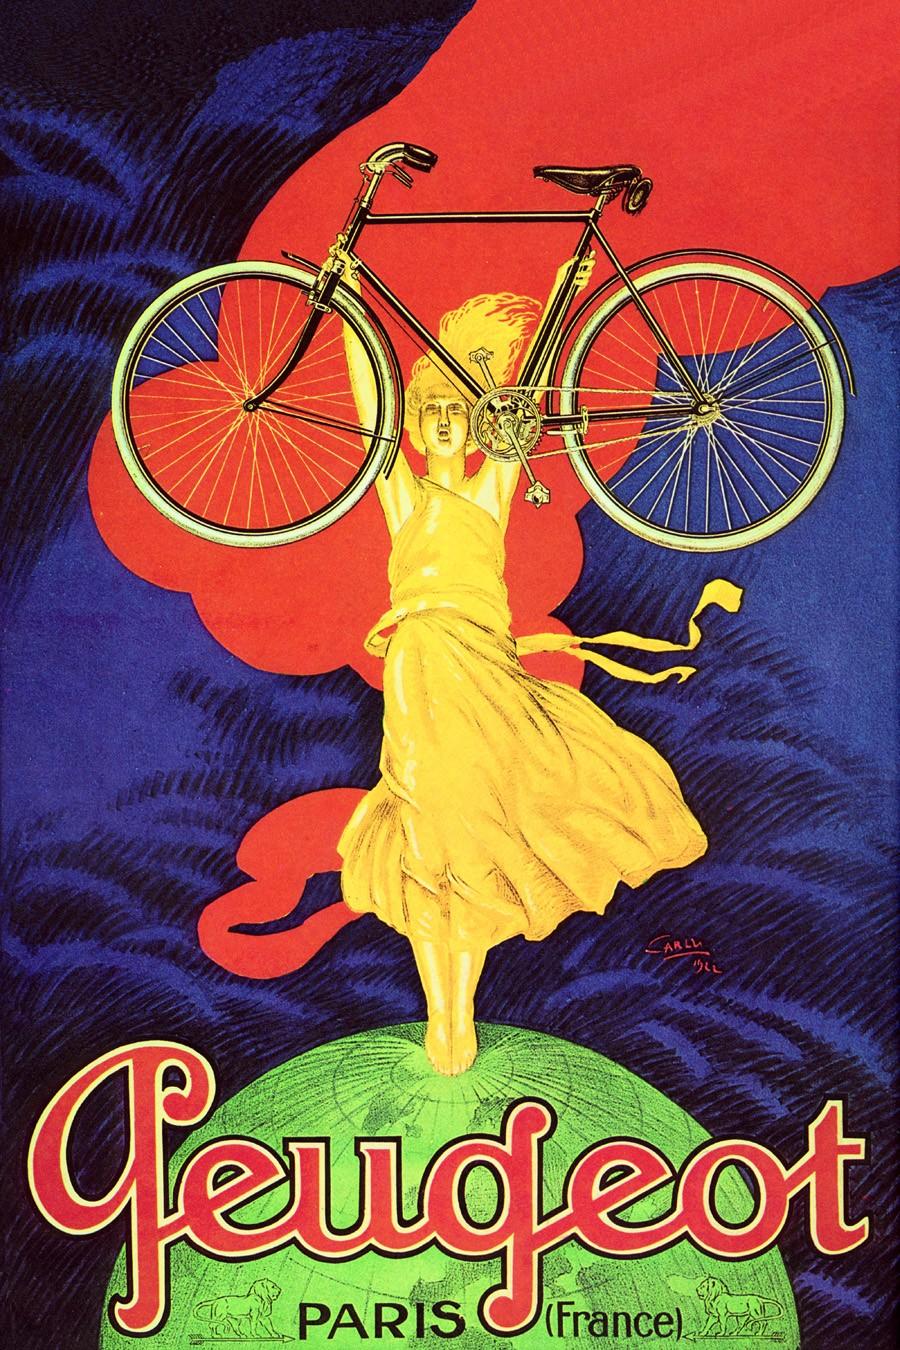 Foto 1 - Cycles Peugeot Paris Globo Garota LoiraBicicletaVintage Cartaz Poster em Papel Matte